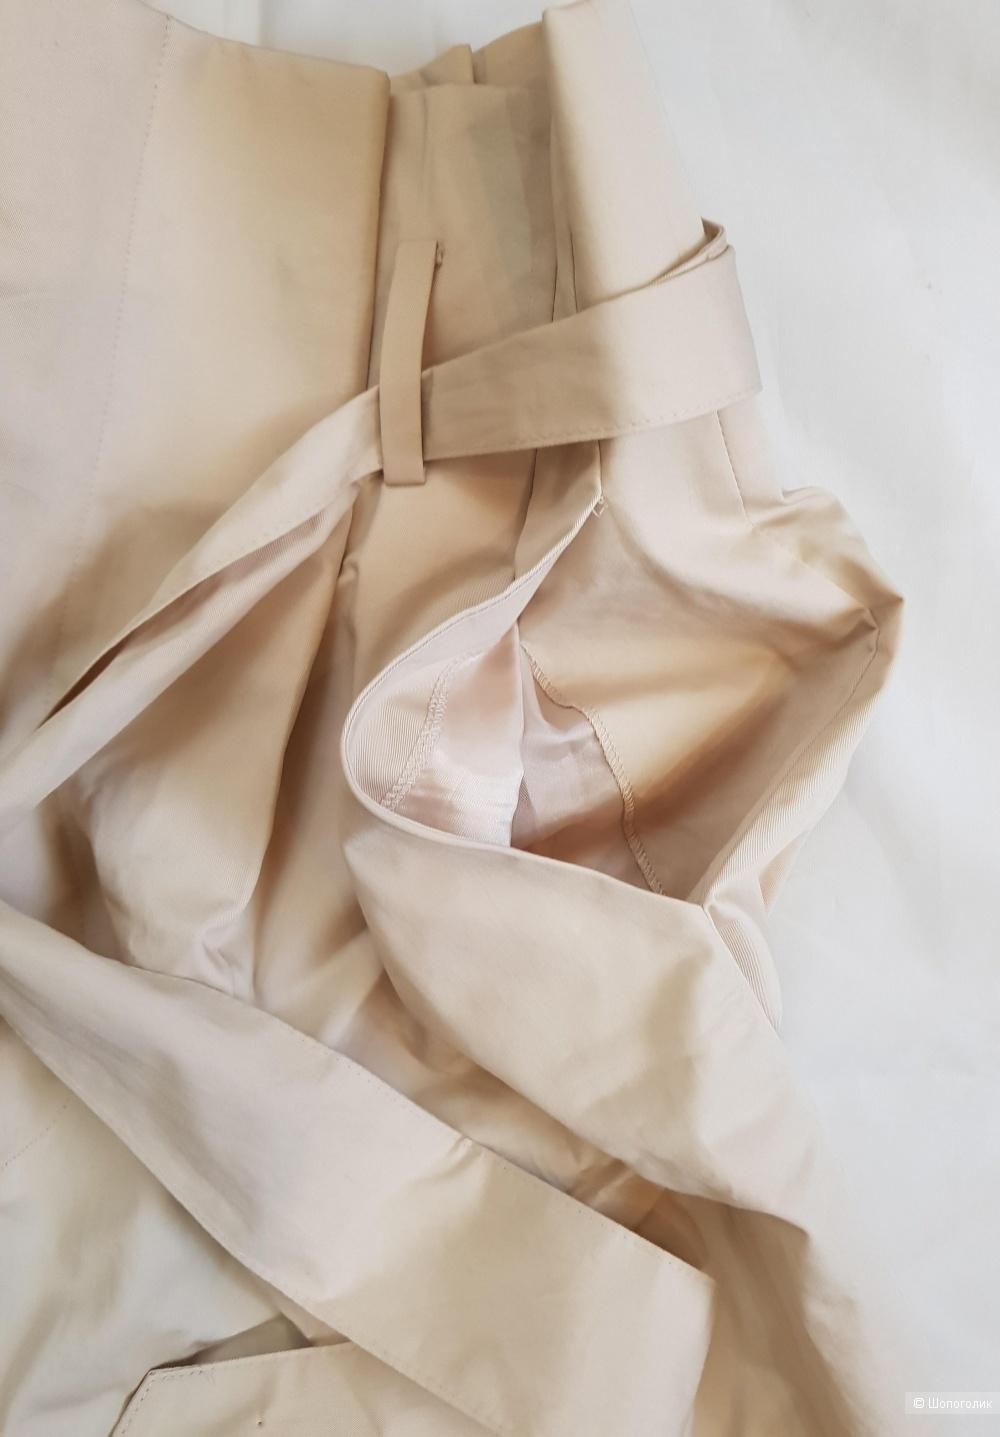 Брюки кюлоты, Zara, 46-48 размер